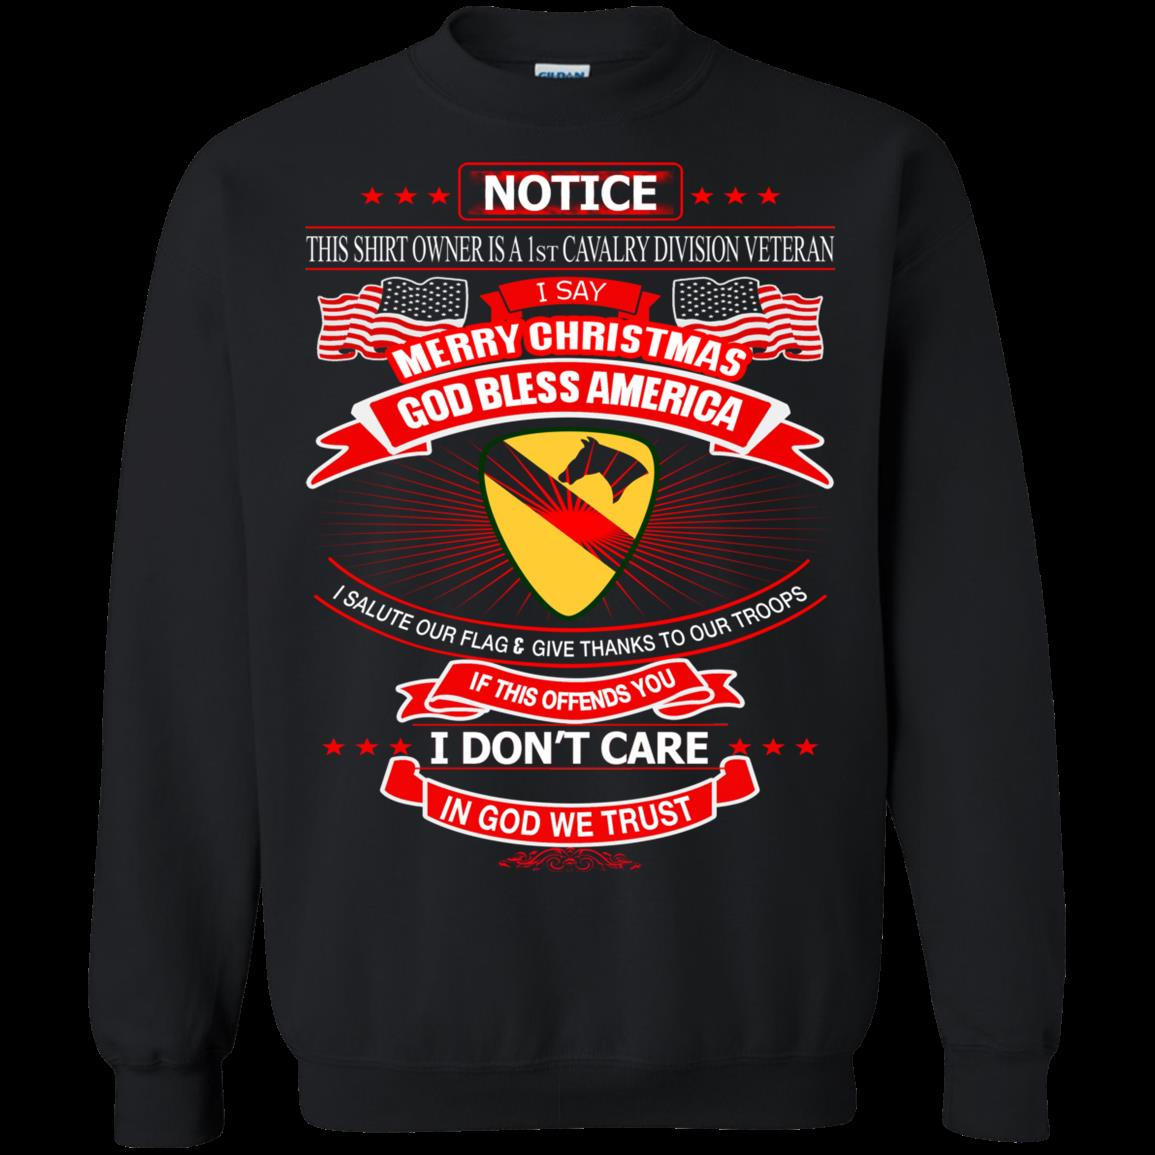 1st Cavalry Divison Veteran Christmas Shirts In God We Trust